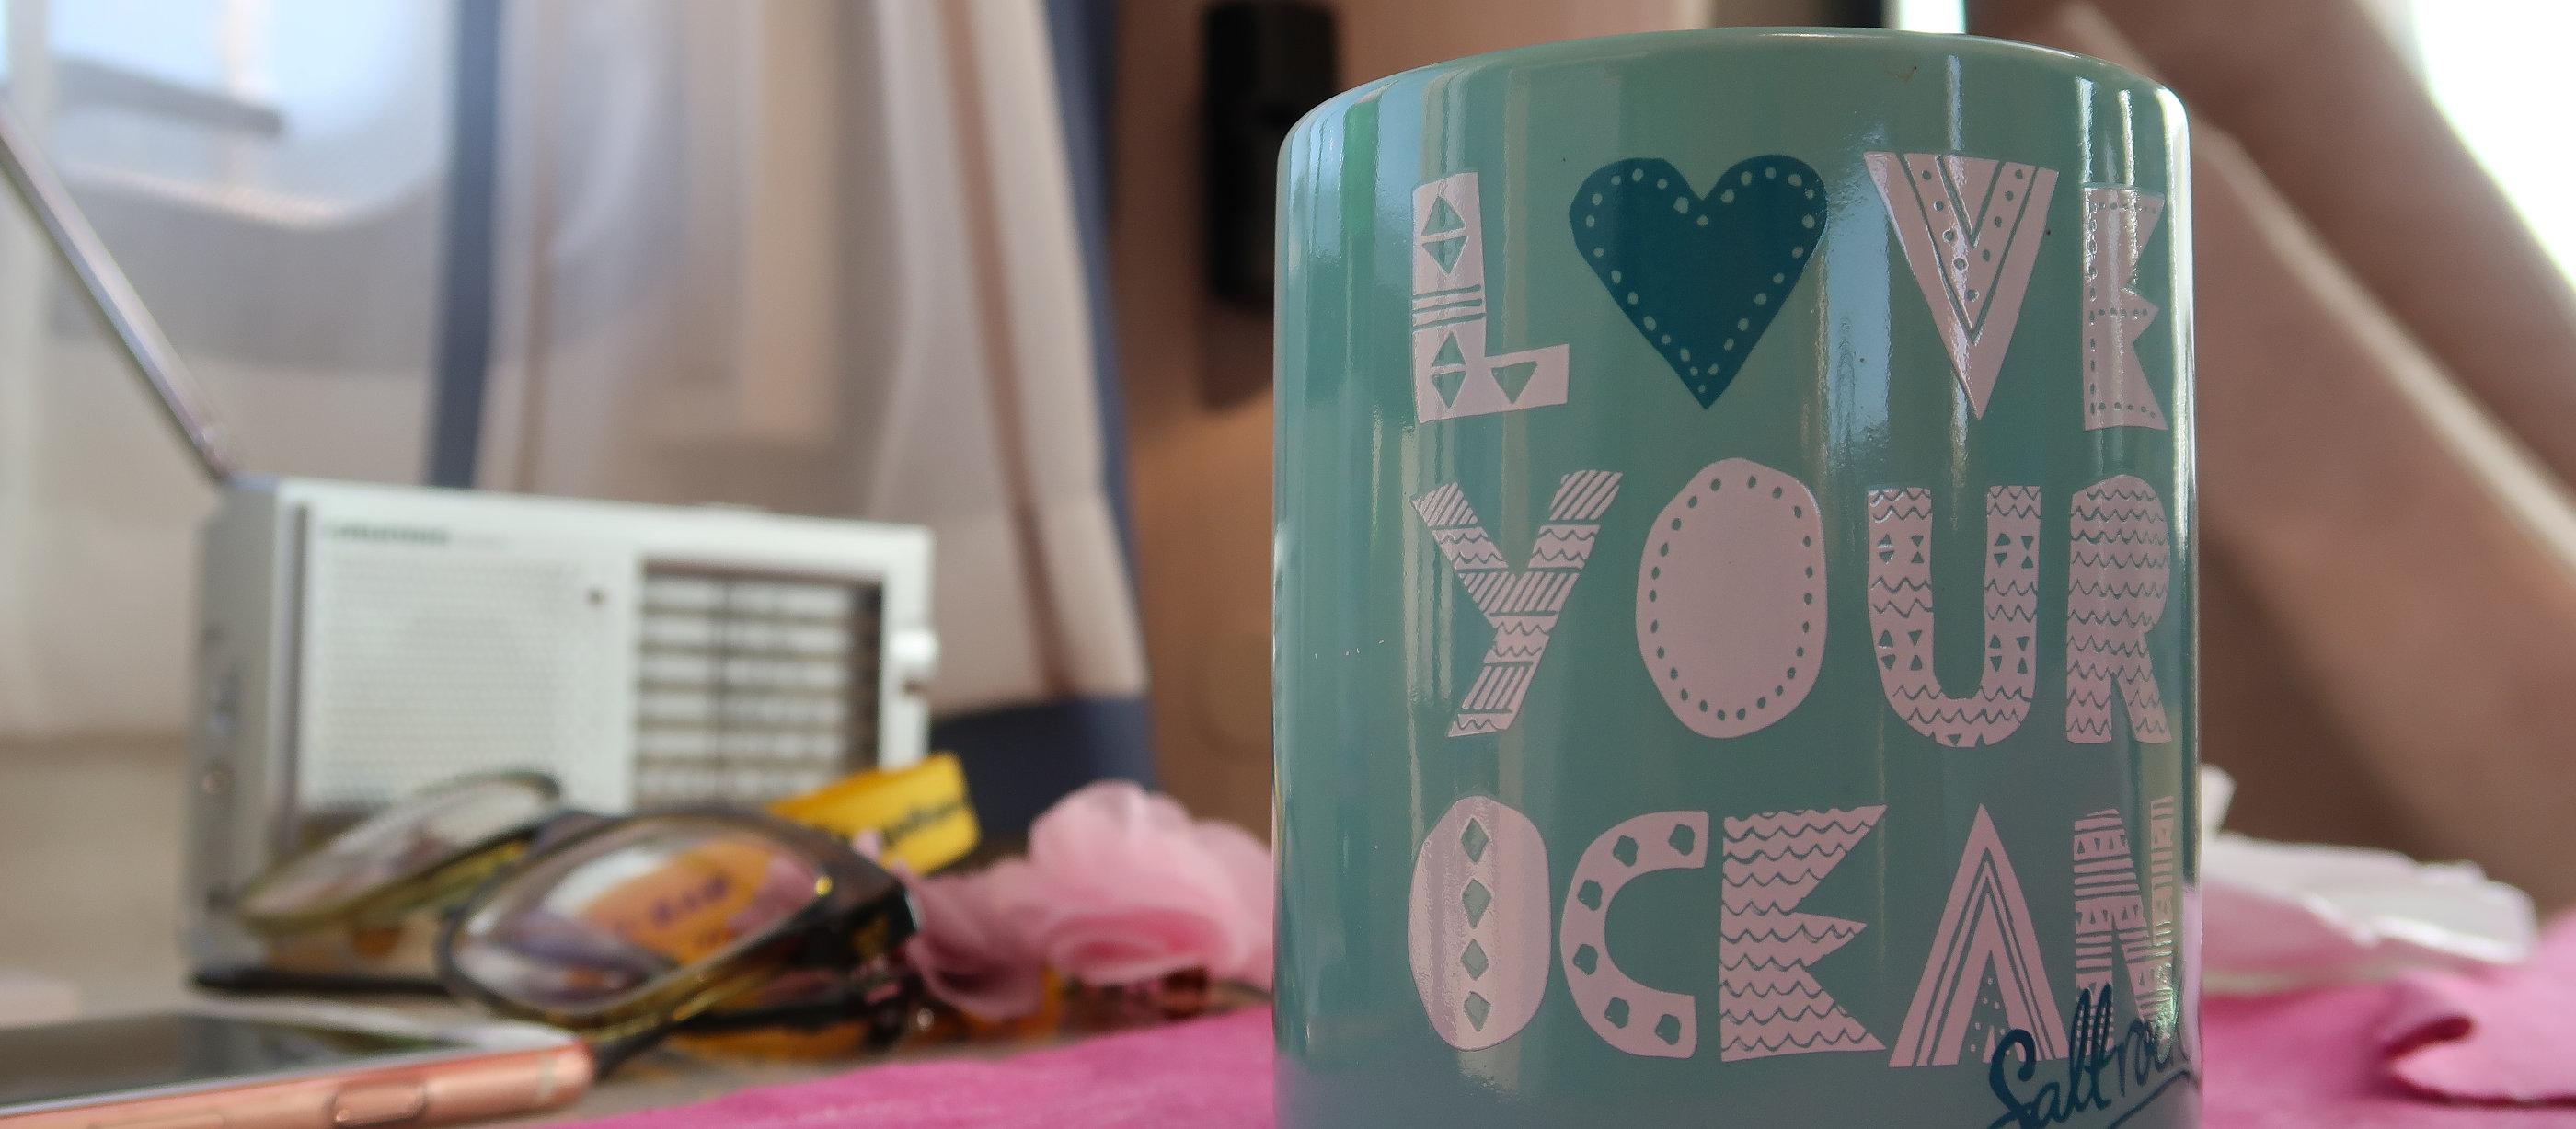 Kaffeetasse im Wohnmobile Love your Ocean